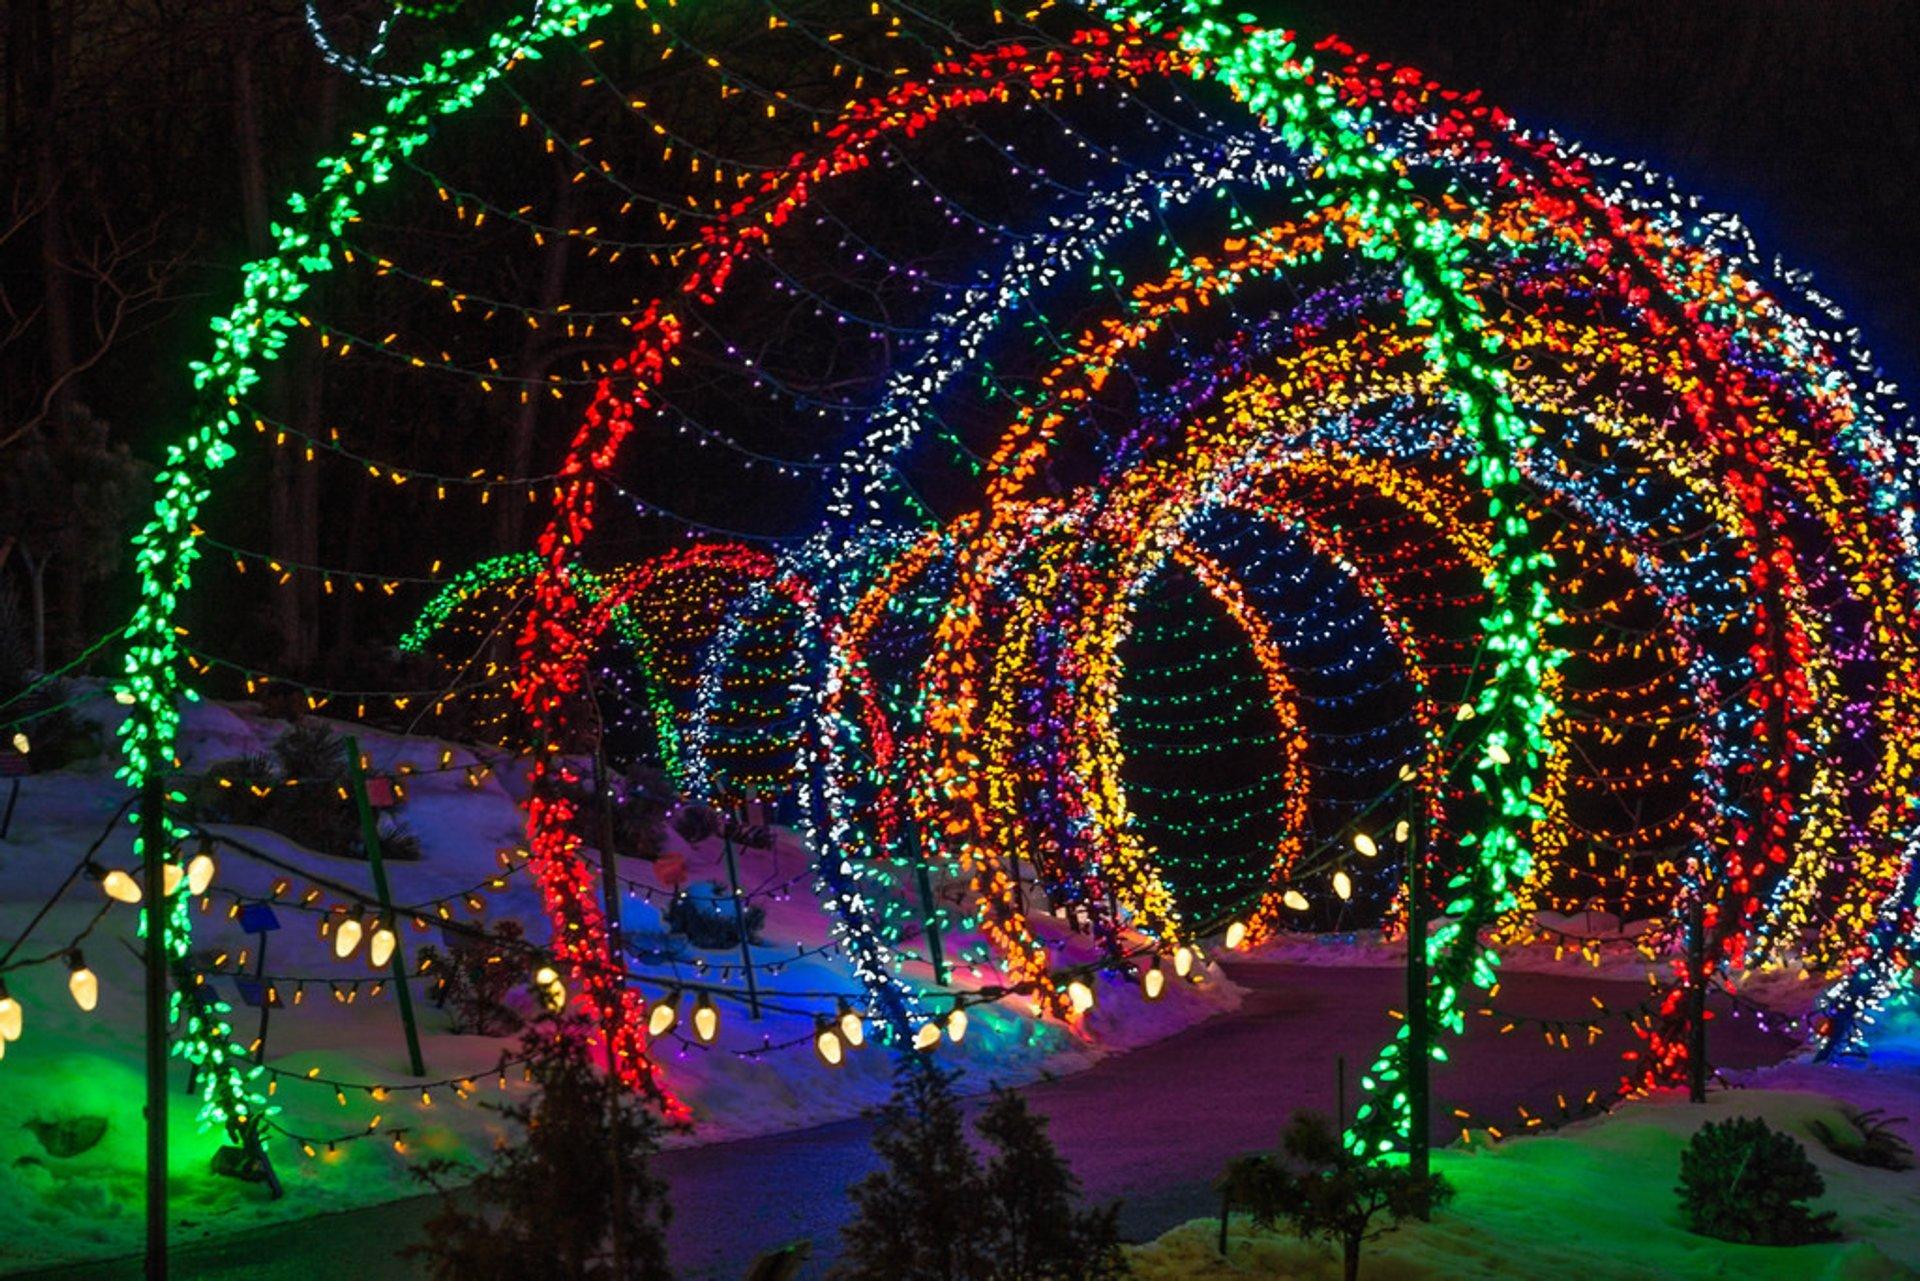 Best time for Garden of Lights at Green Bay Botanical Garden 2020